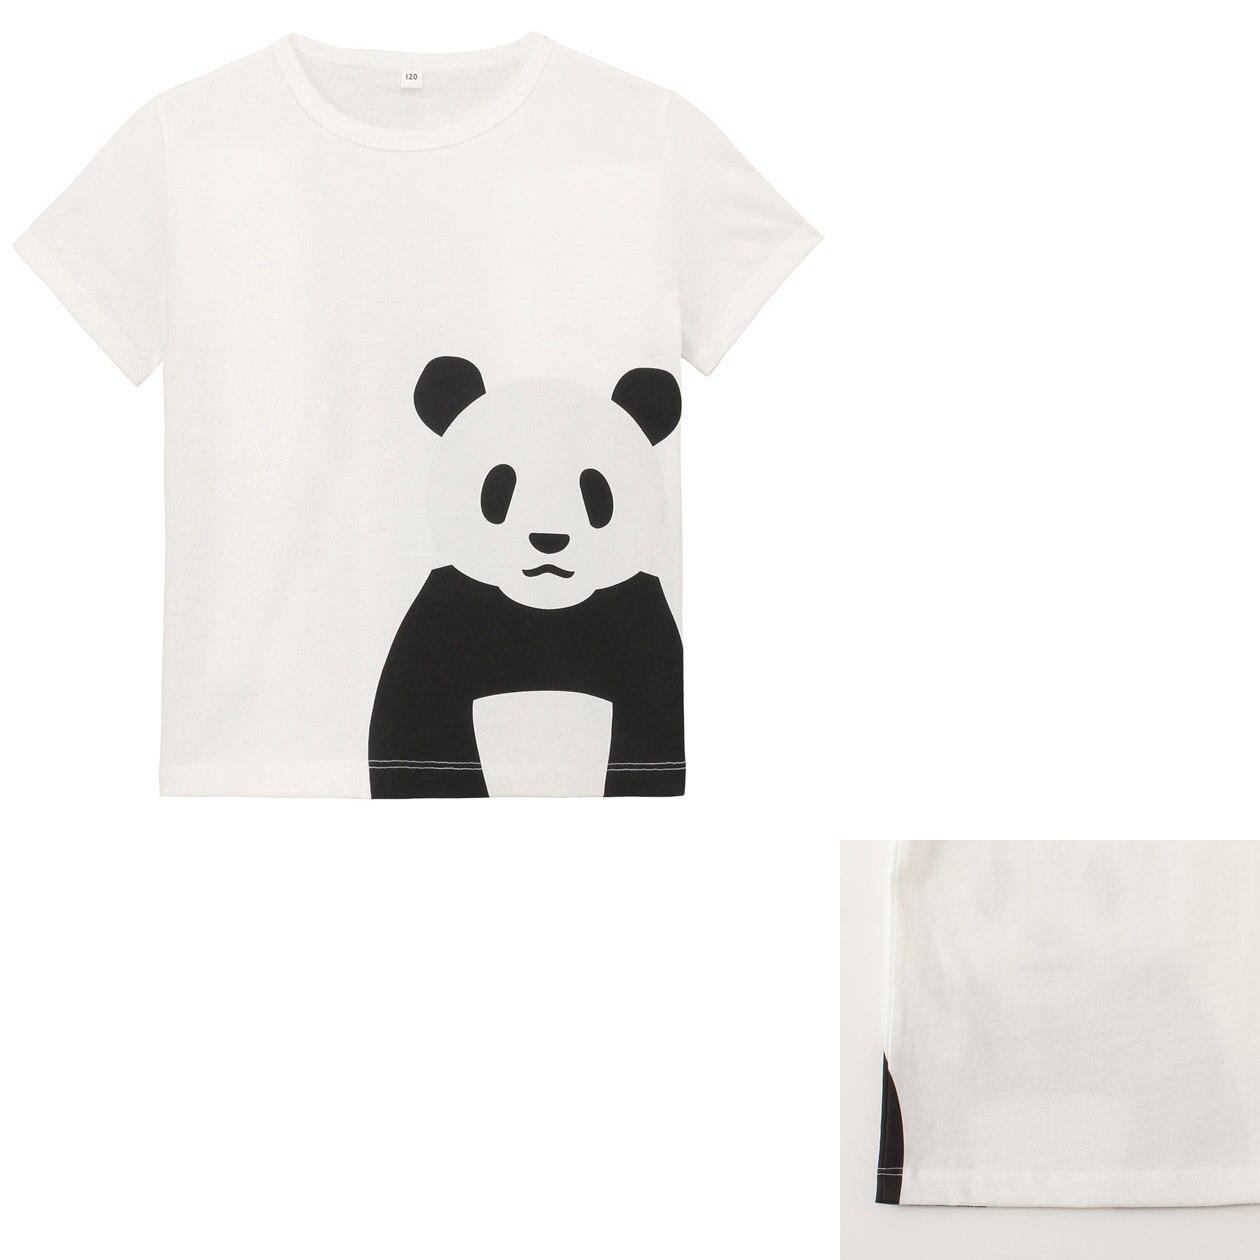 Organic cotton printed t shirt kids 120 giant panda muji for Organic cotton t shirt printing